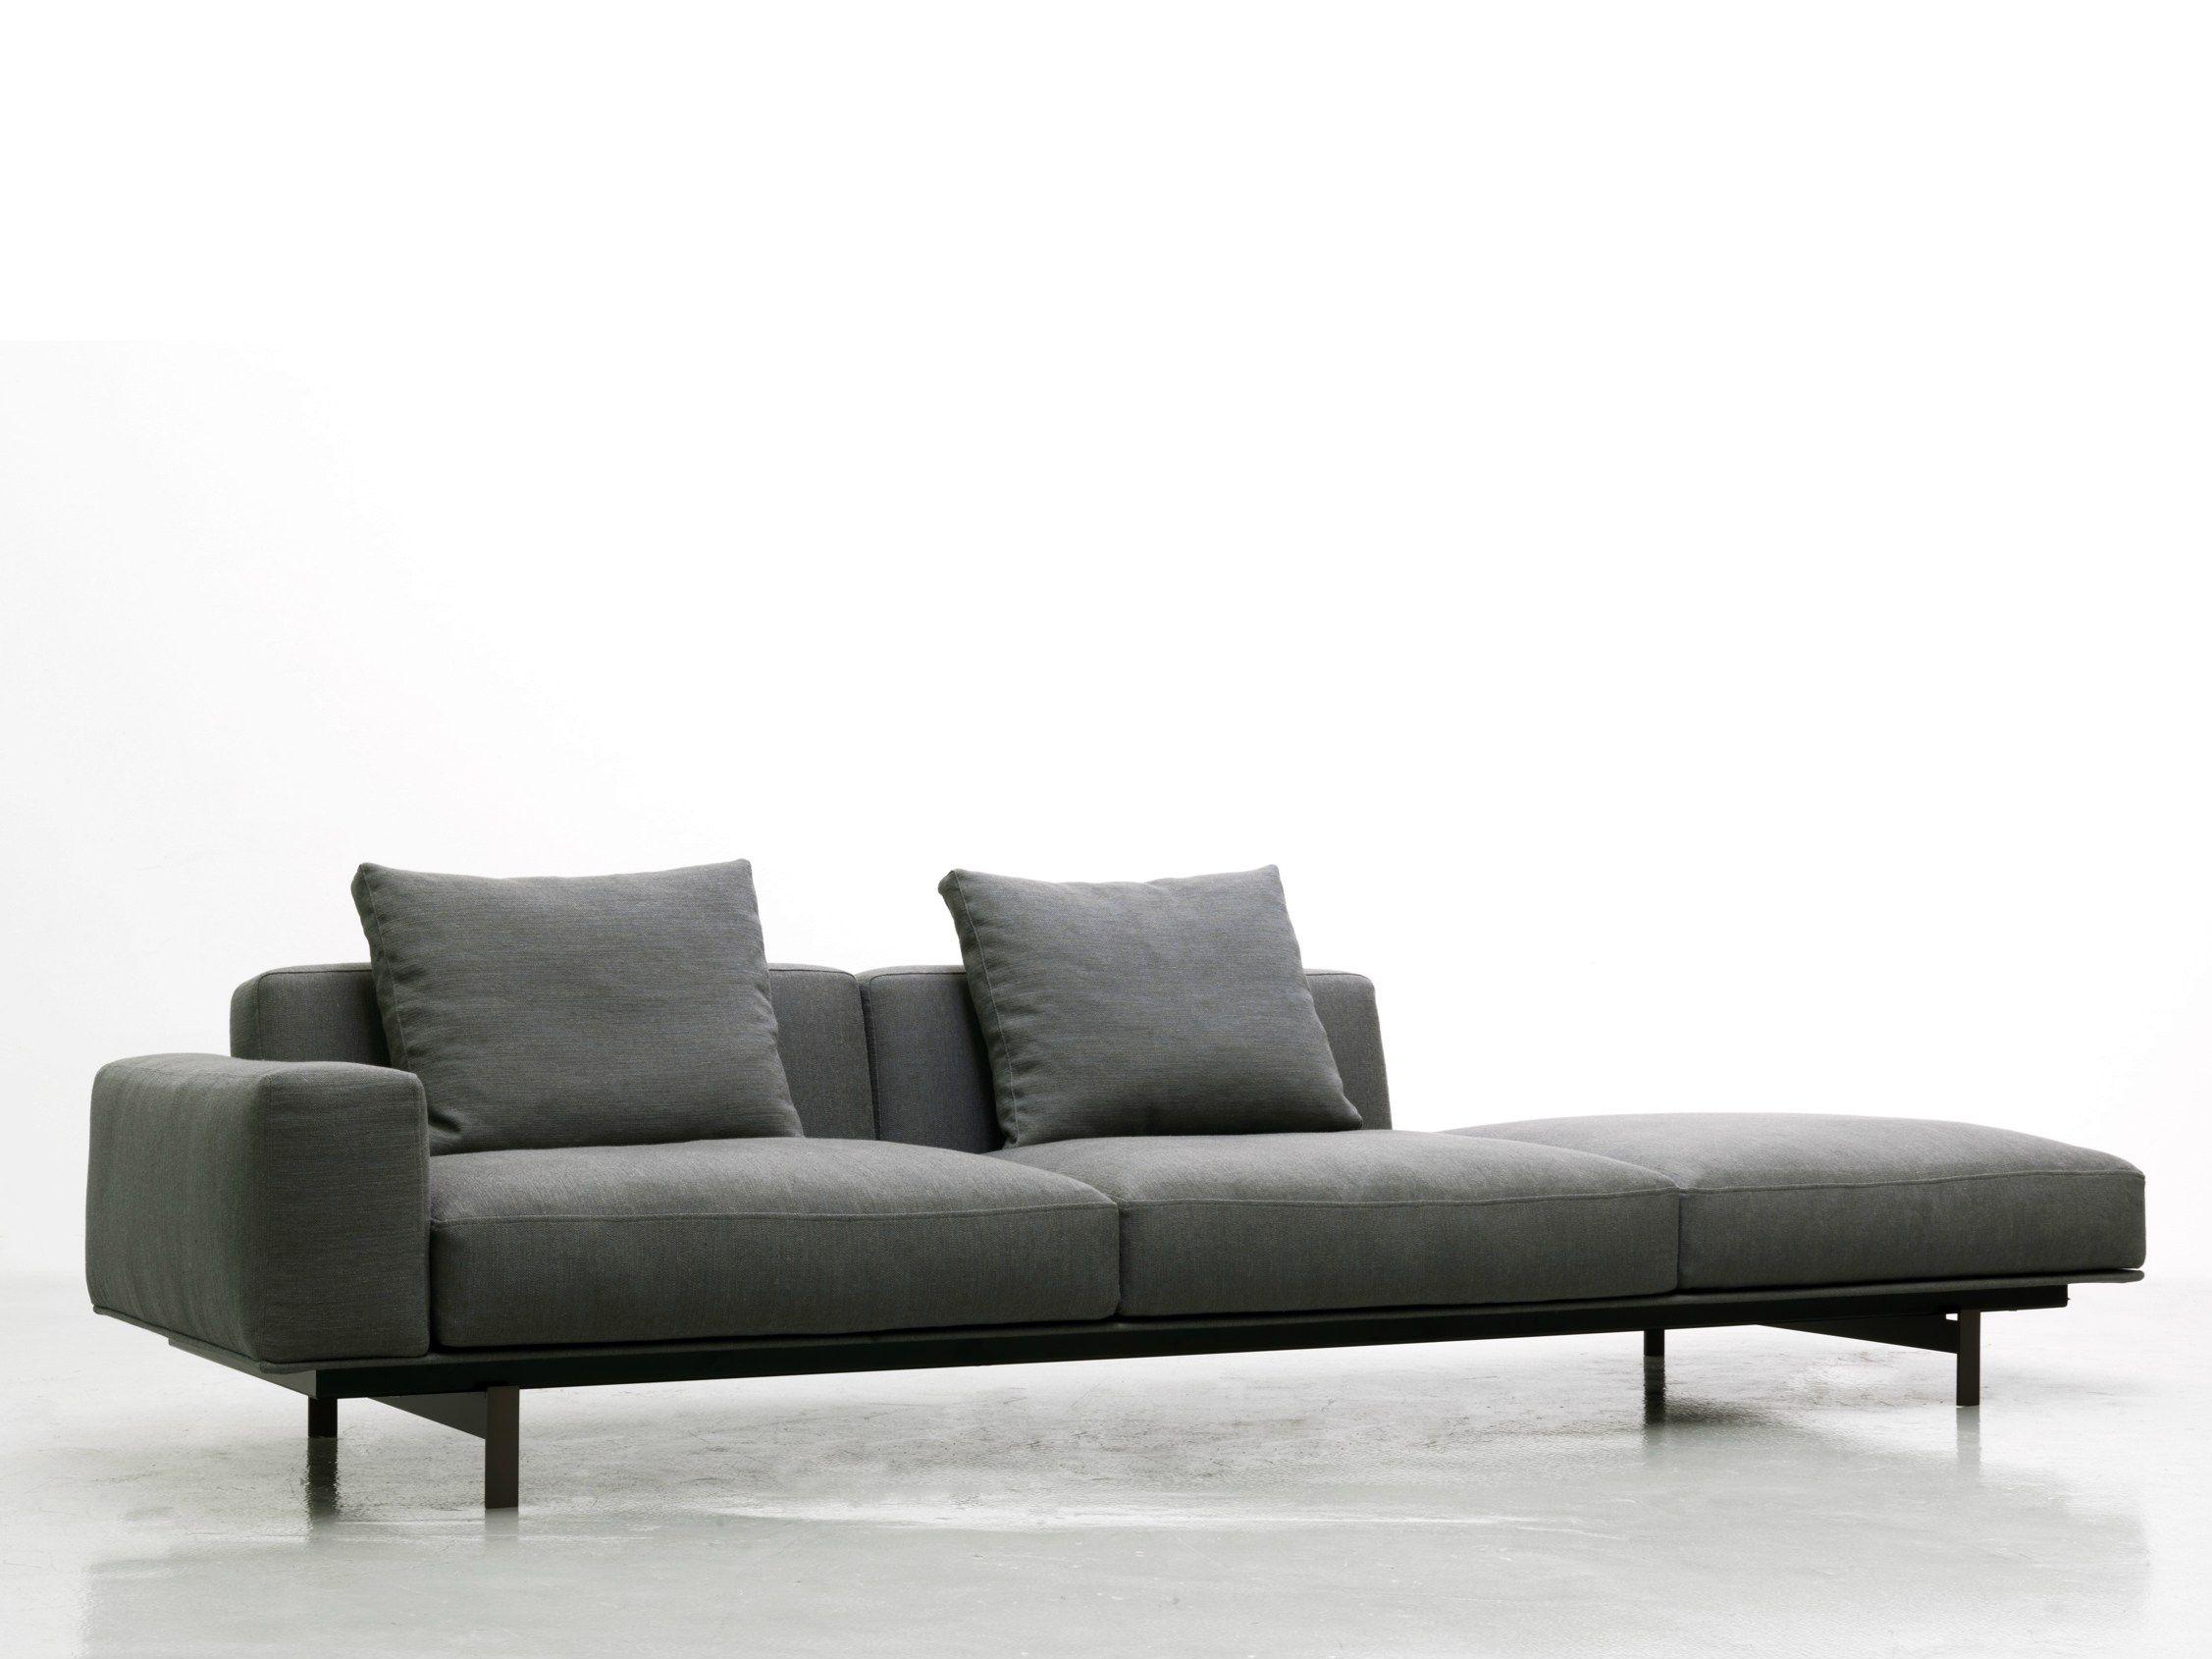 Yard Sofa By Francesco Rota For Lema Supreme Furniture Architecture Blog Upholstered Seating Versatile Sofa Furniture